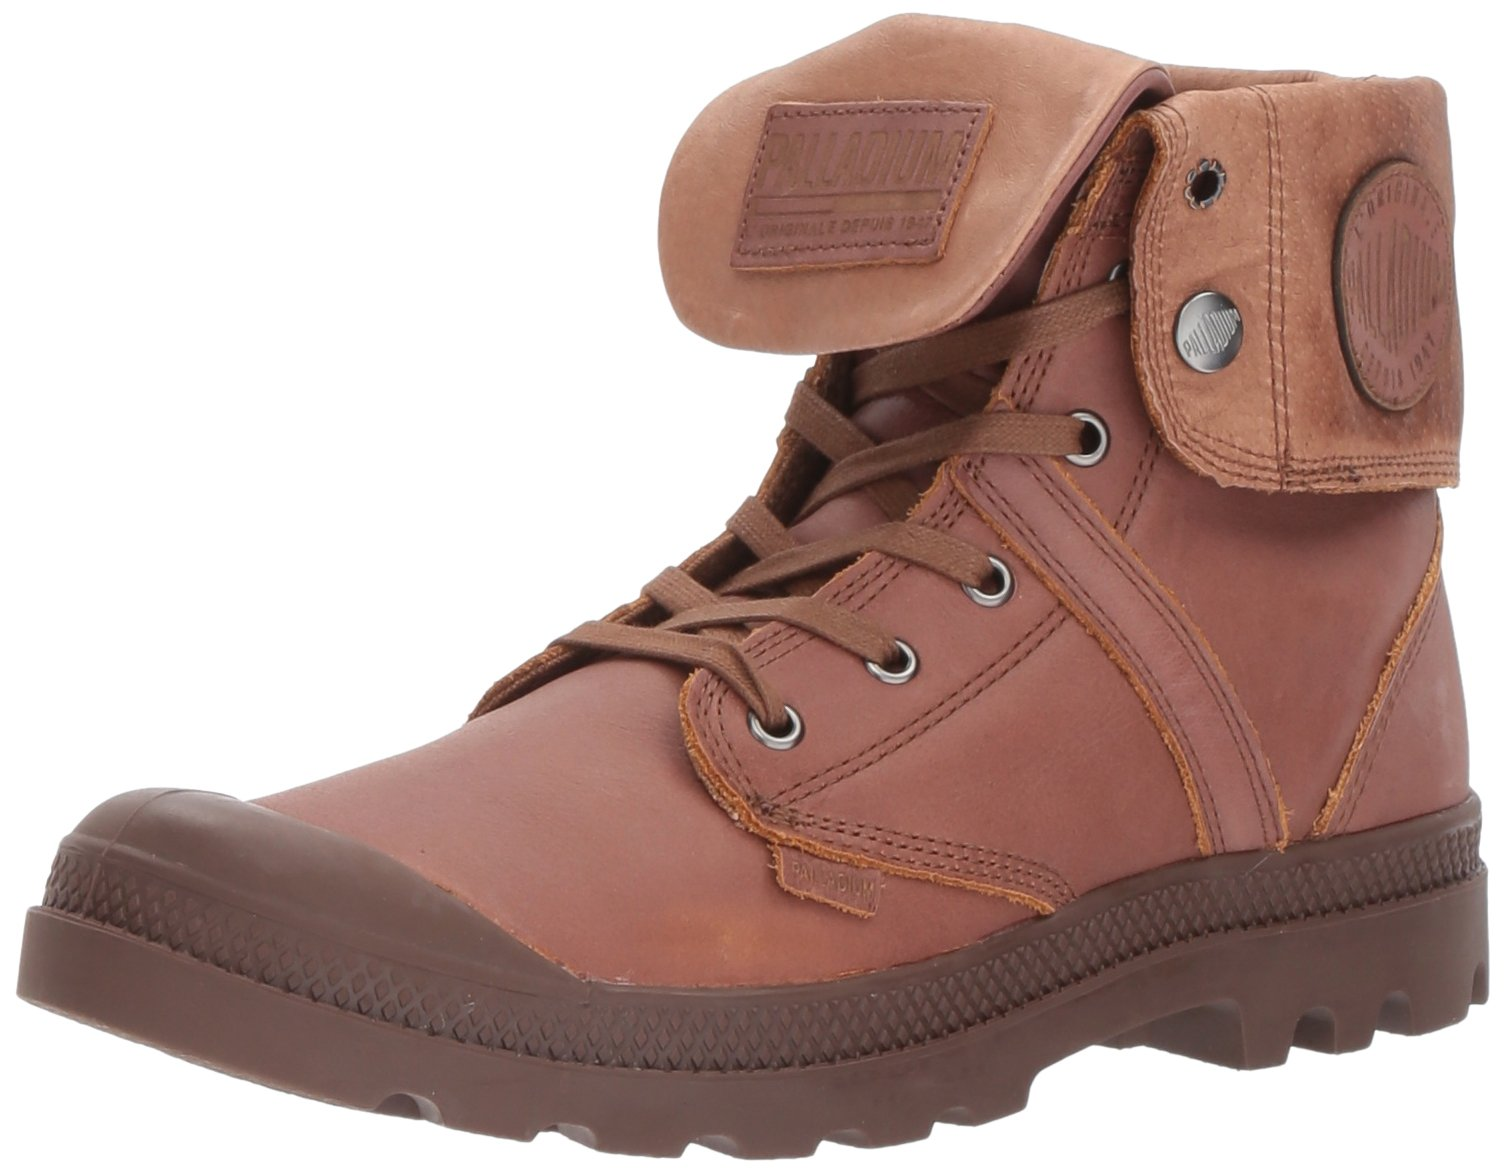 Palladium Men's Pallabrouse Baggy L2 Chukka Boot, Sunrise, 10.5 M US